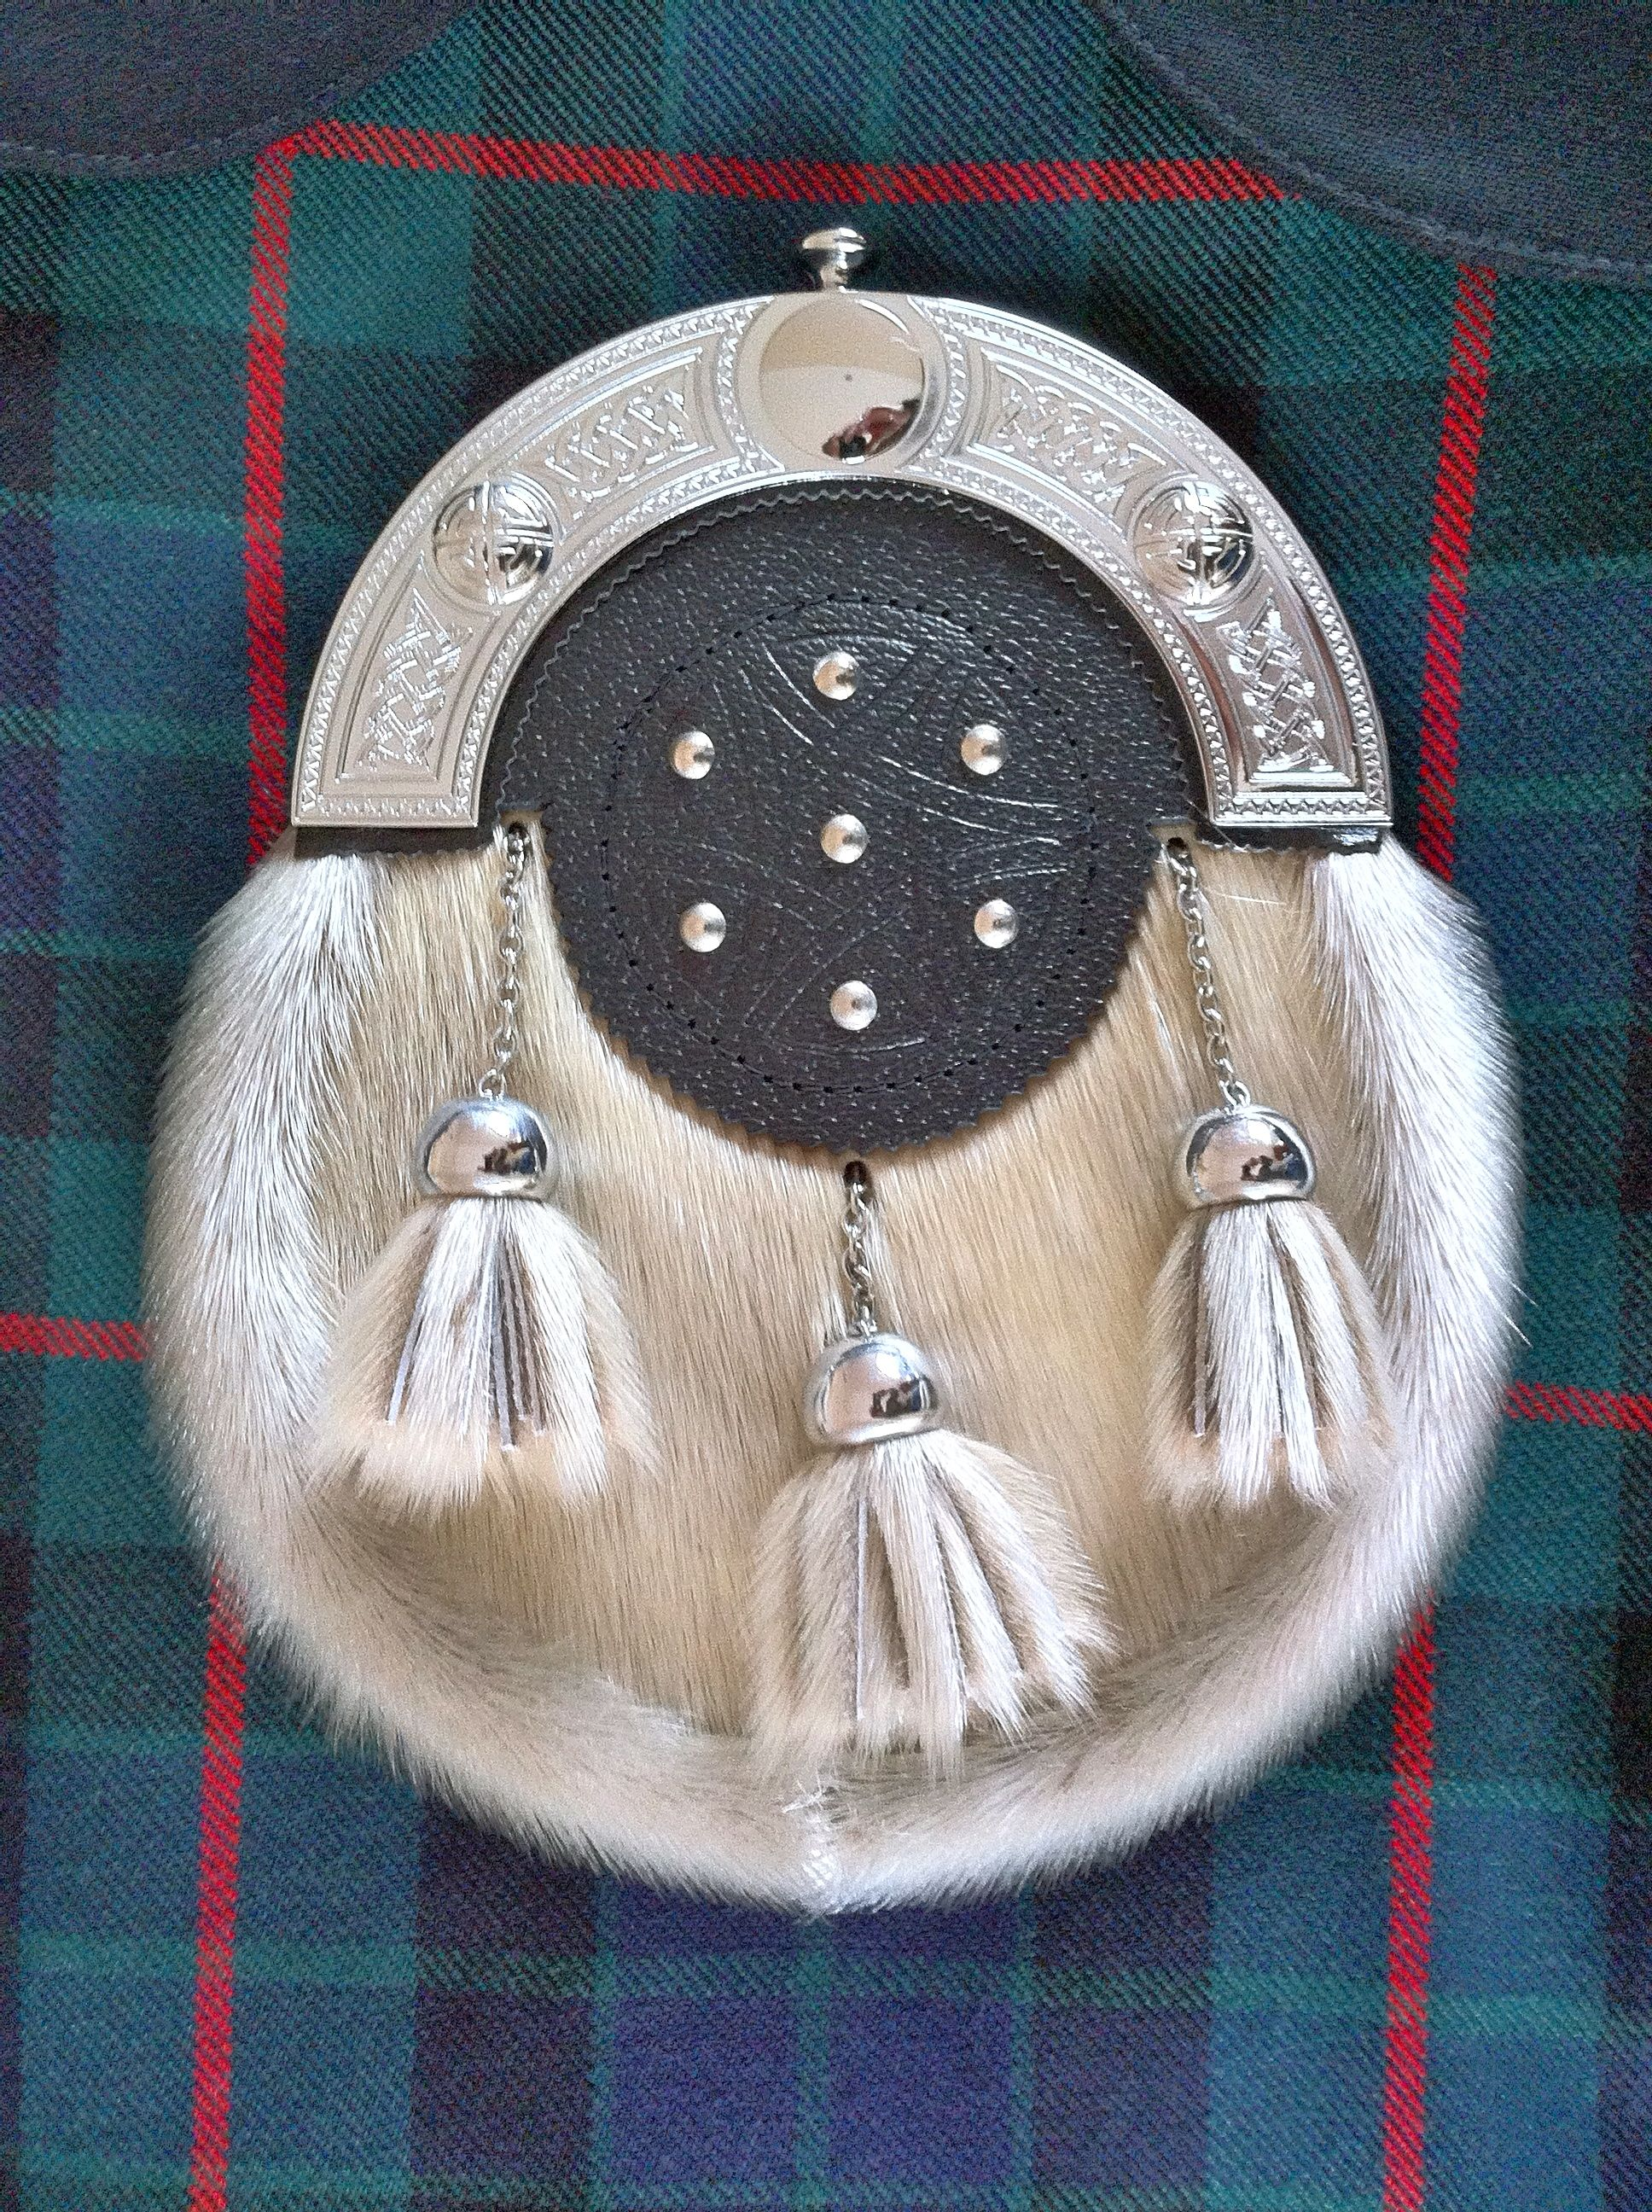 Pin By Edurne Abad Arrieta On Homecoming Scotland Scottish Heritage Scottish Tartans Scottish Clans